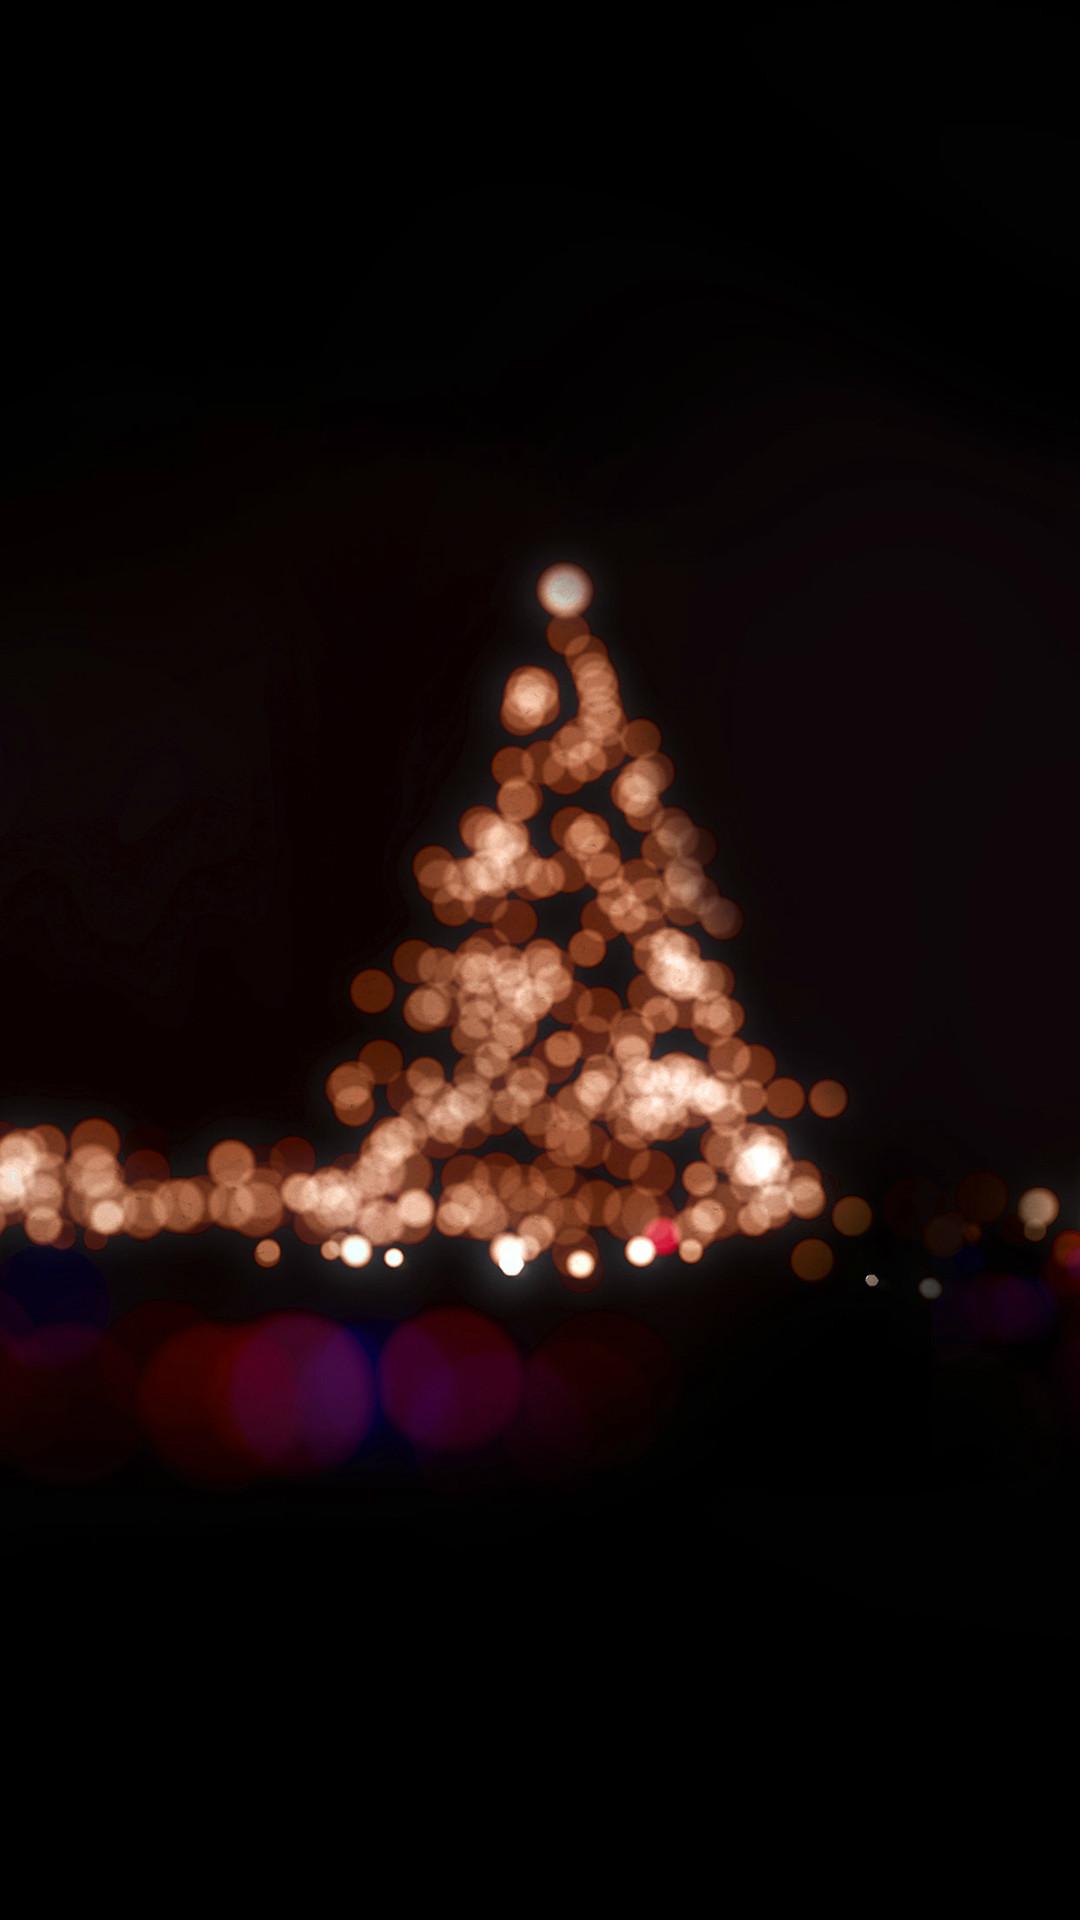 Christmas Lights Bokeh Love Dark Night iPhone 8 wallpaper